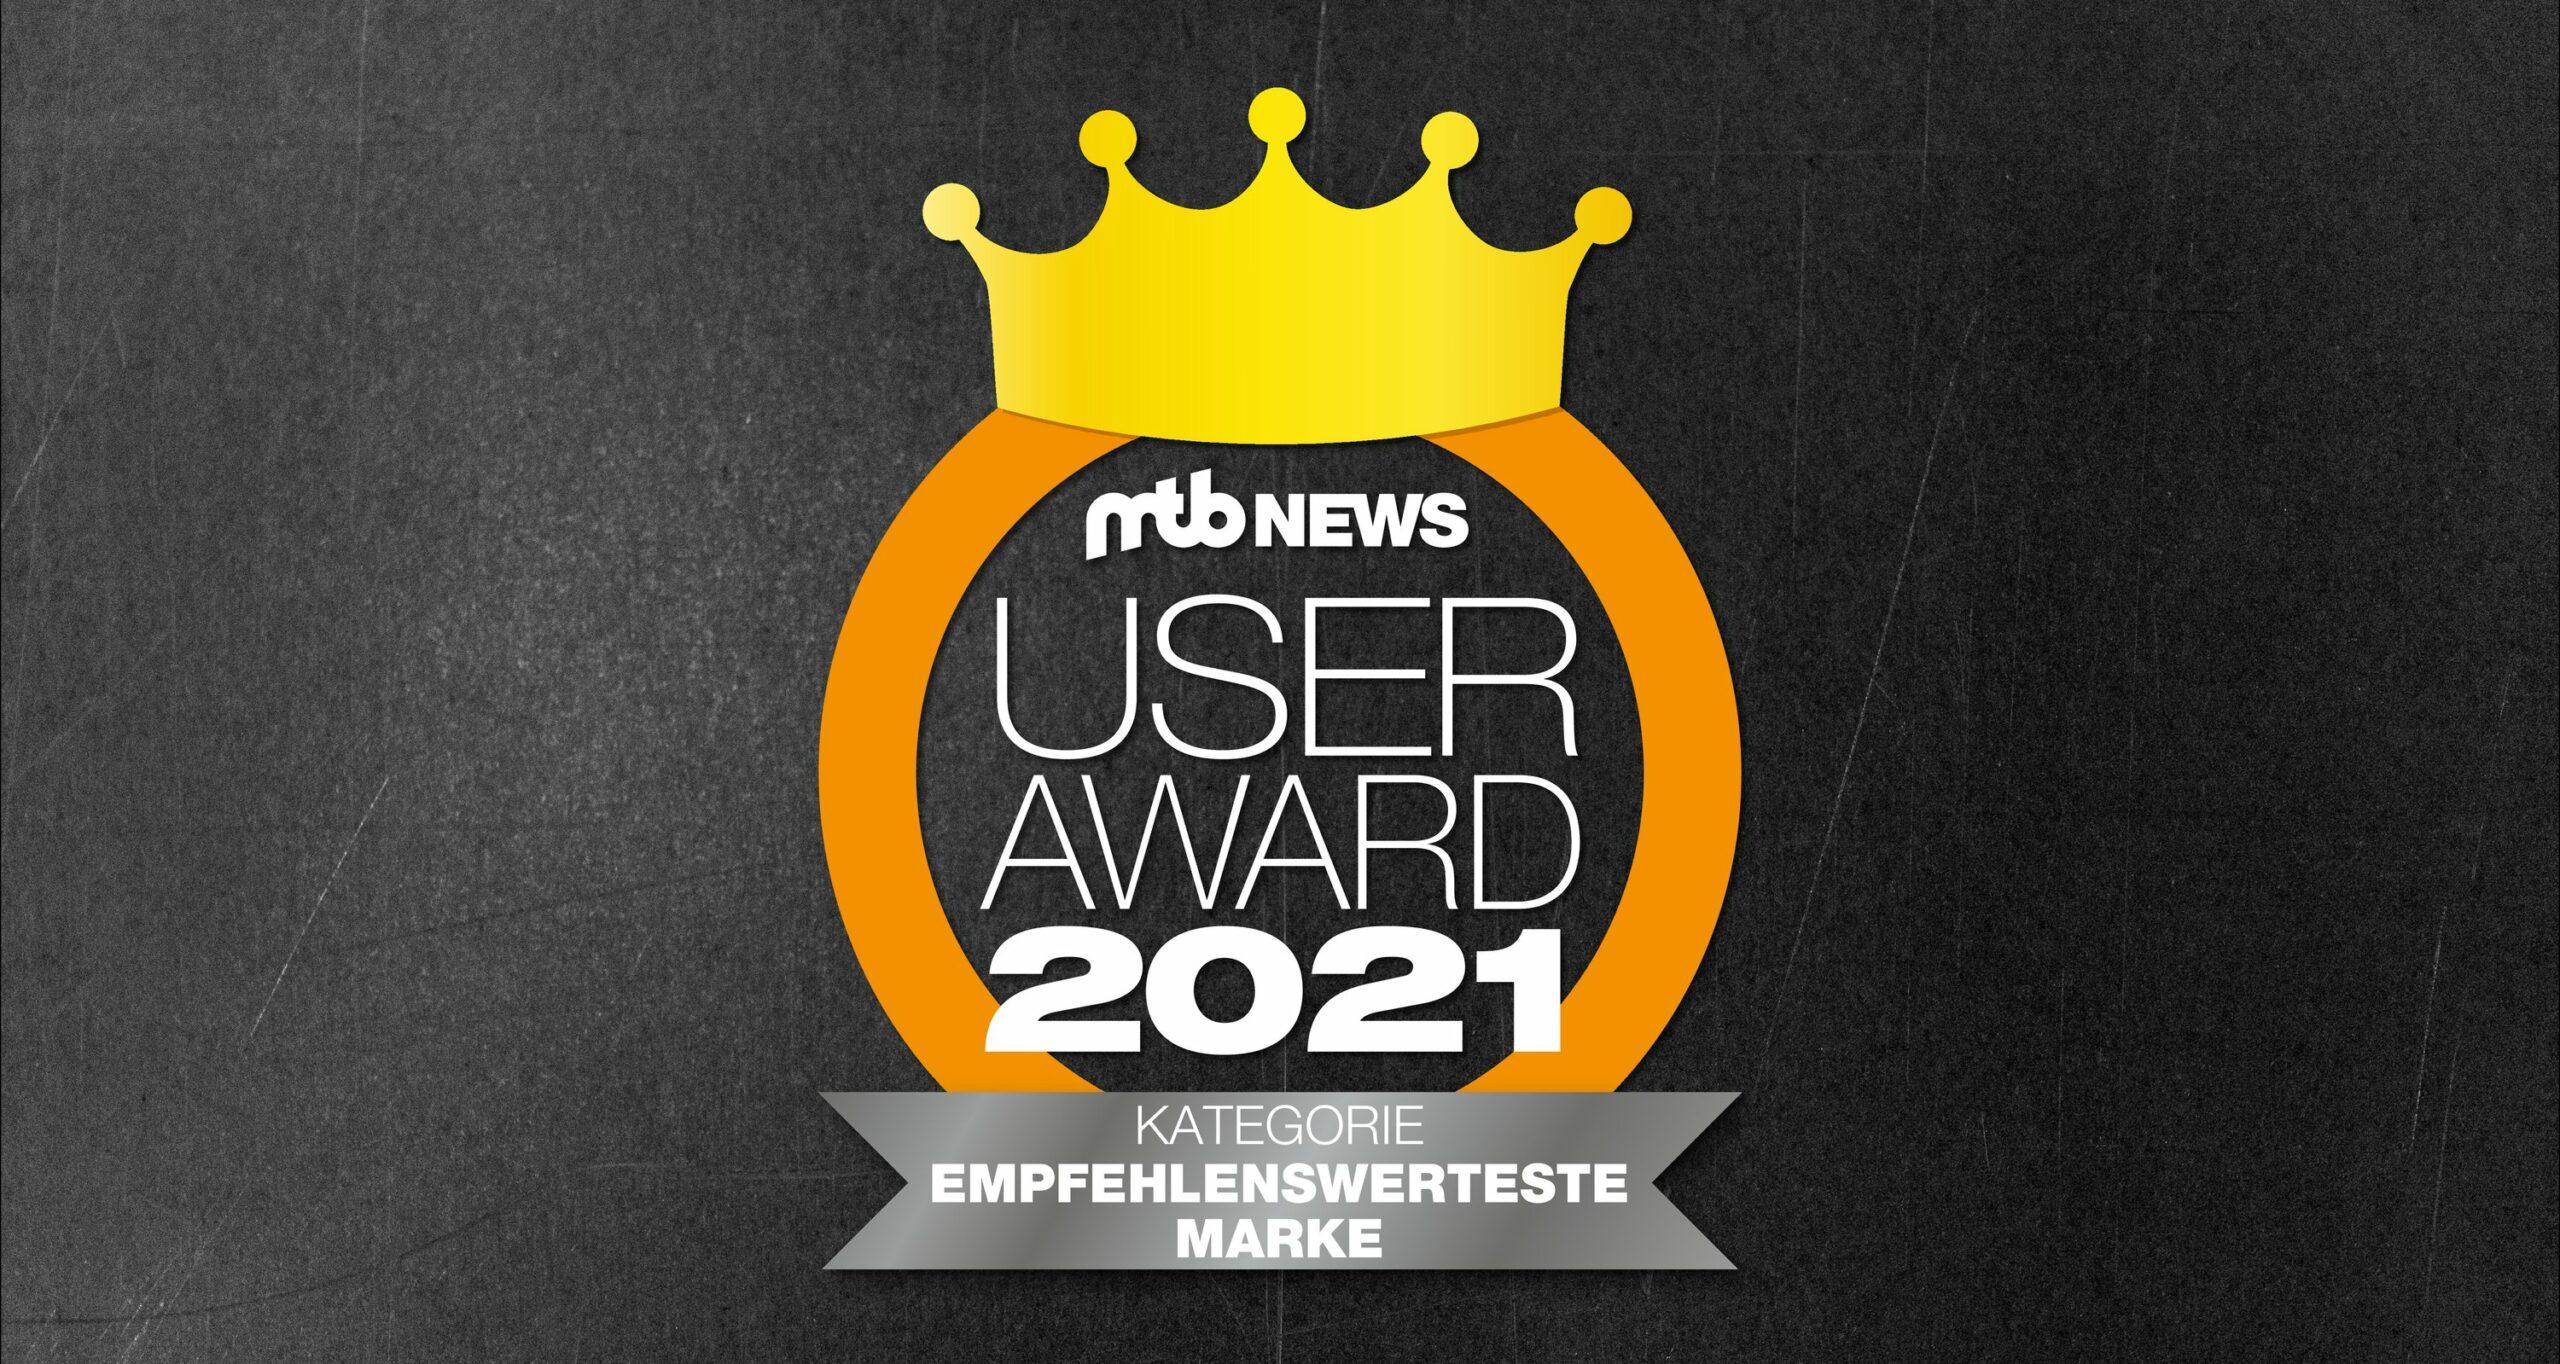 MTB-News User Award 2021: Empfehlenswerteste Marke des Jahres - MTB-News.de